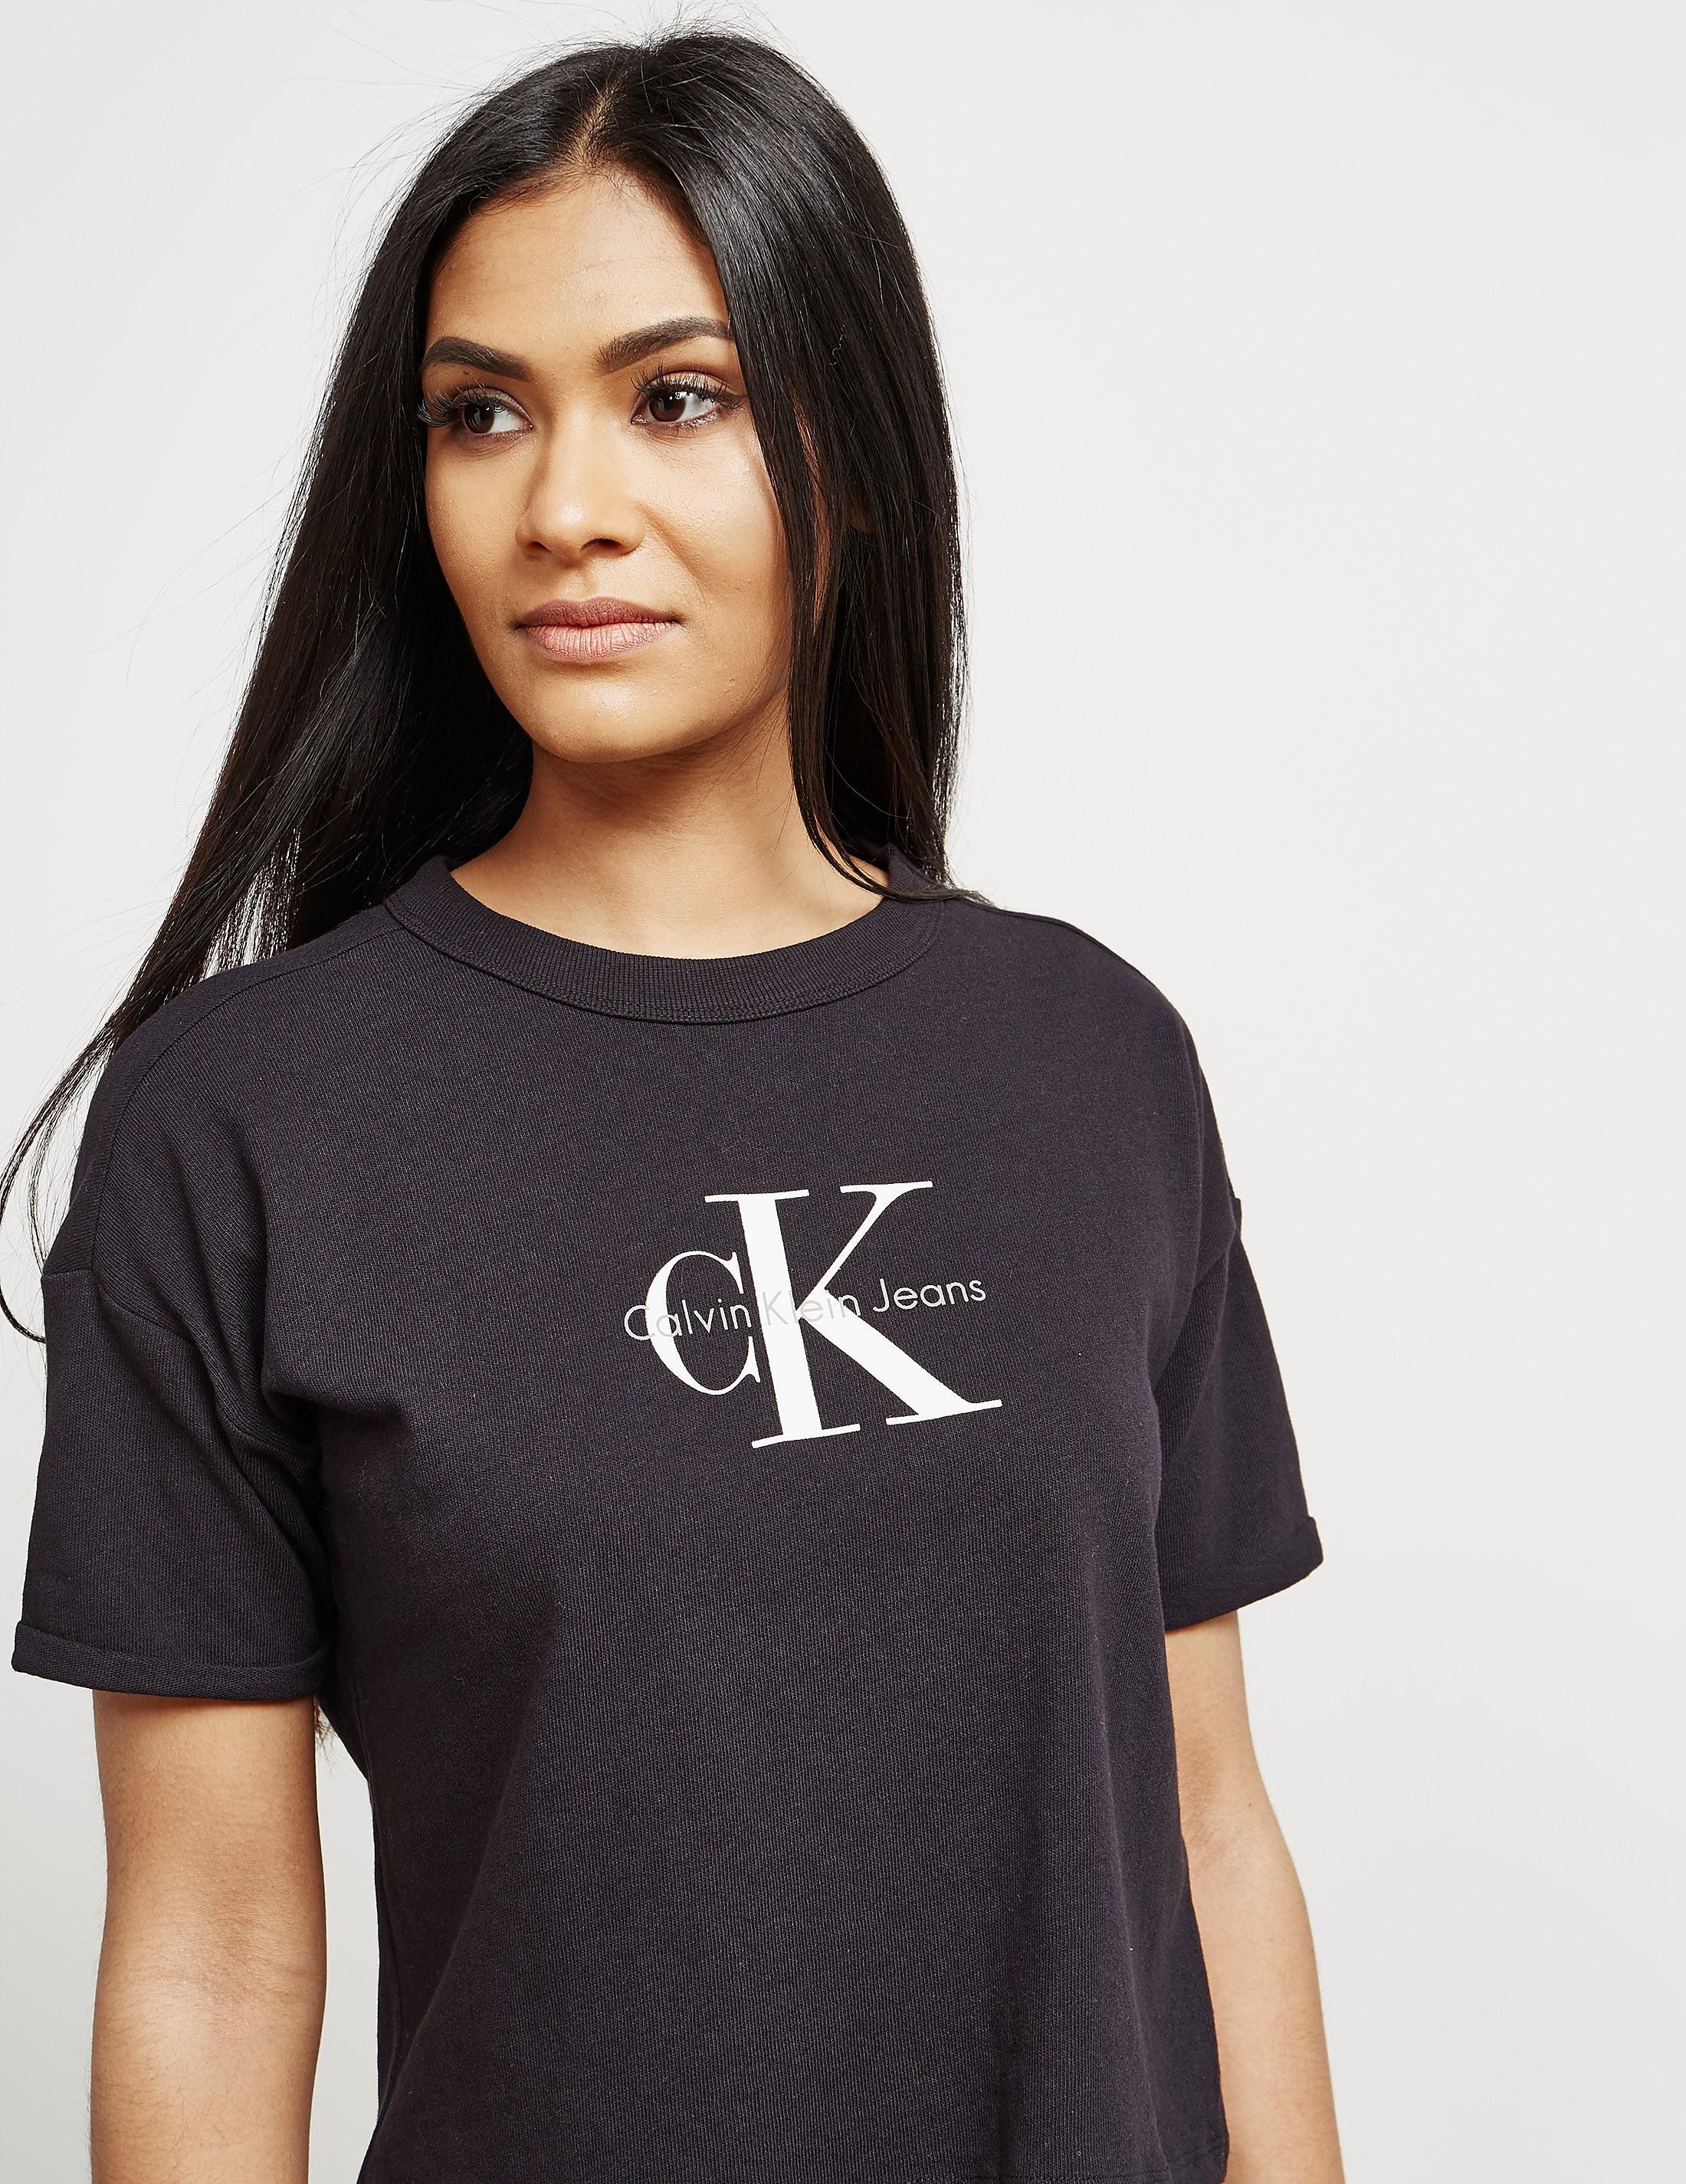 Calvin Klein Teco Short Sleeve Crop T-Shirt